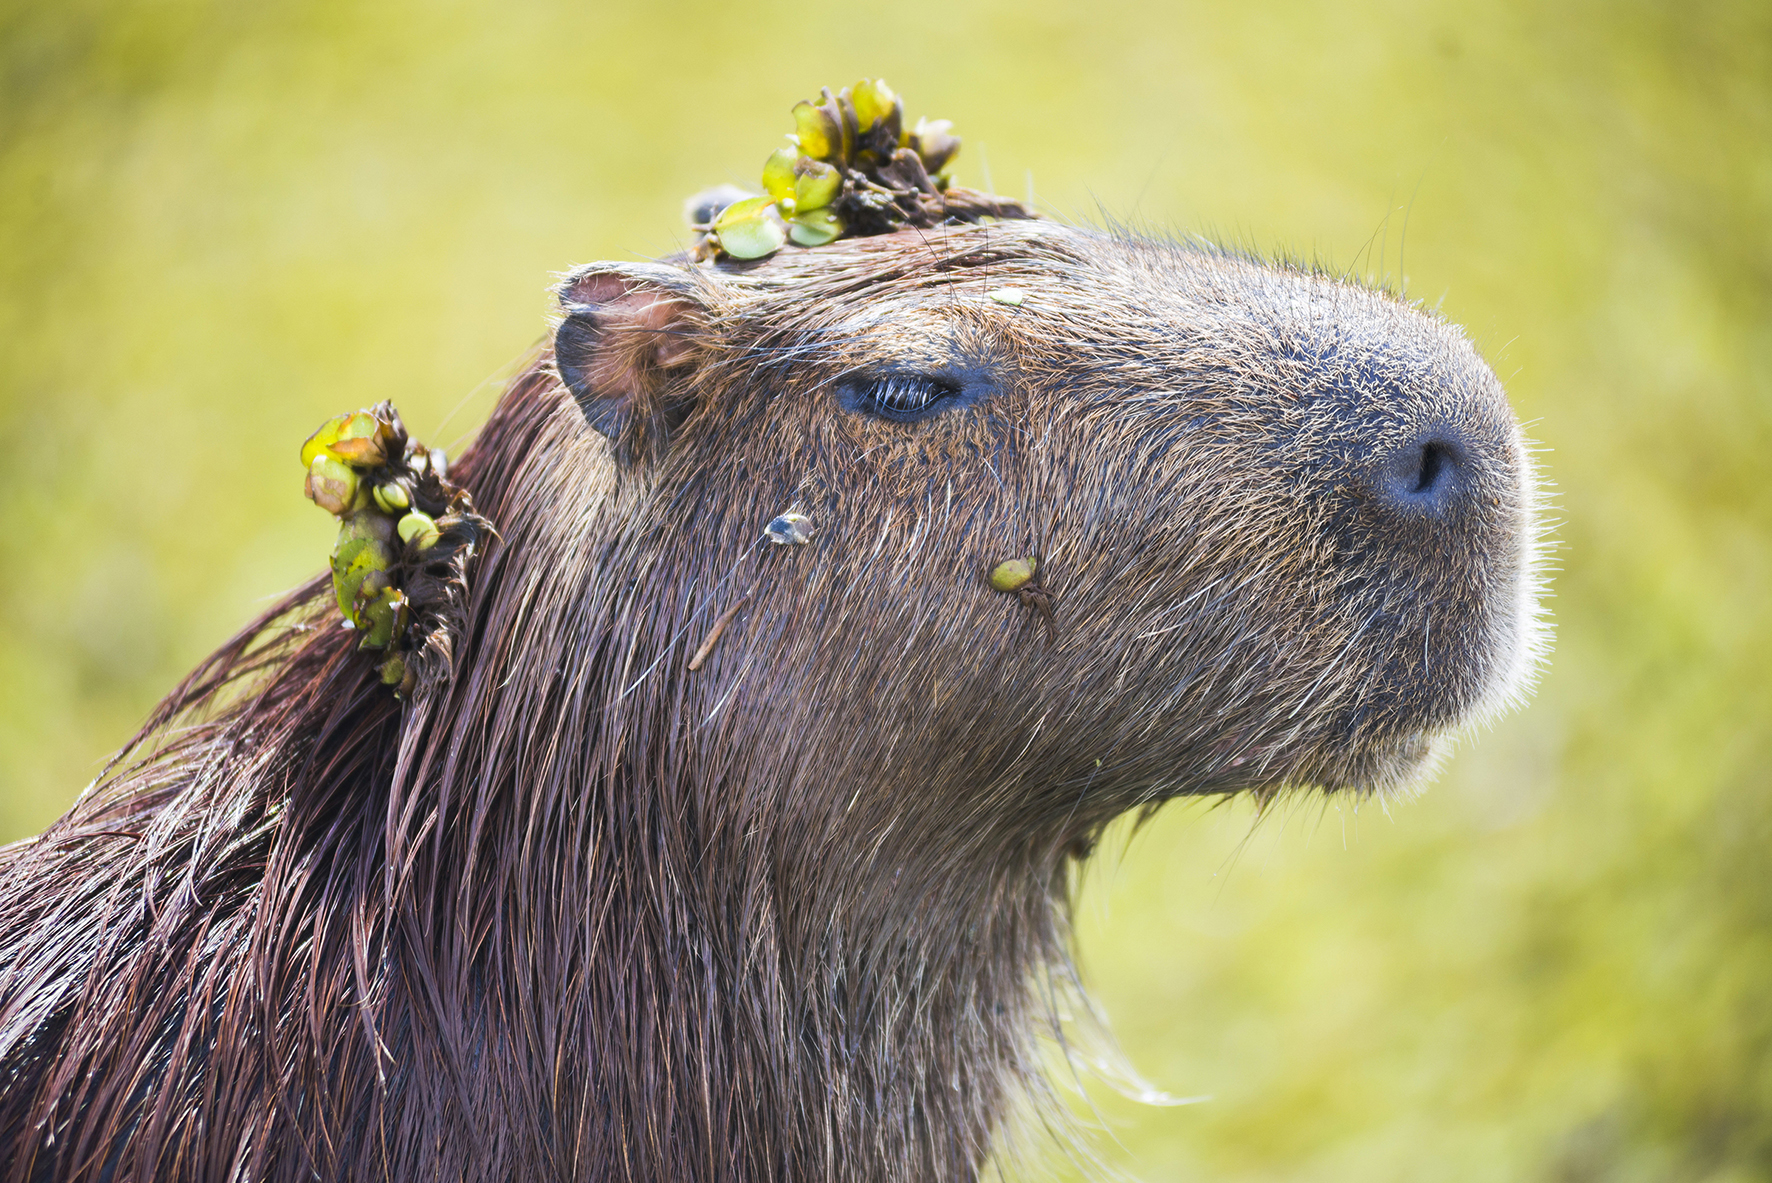 Capybara (Hydrochoerus hydrochaeris), Ibera Wetlands (aka Ibera Marshes), a marshland area in Corrientes Province, Argentina